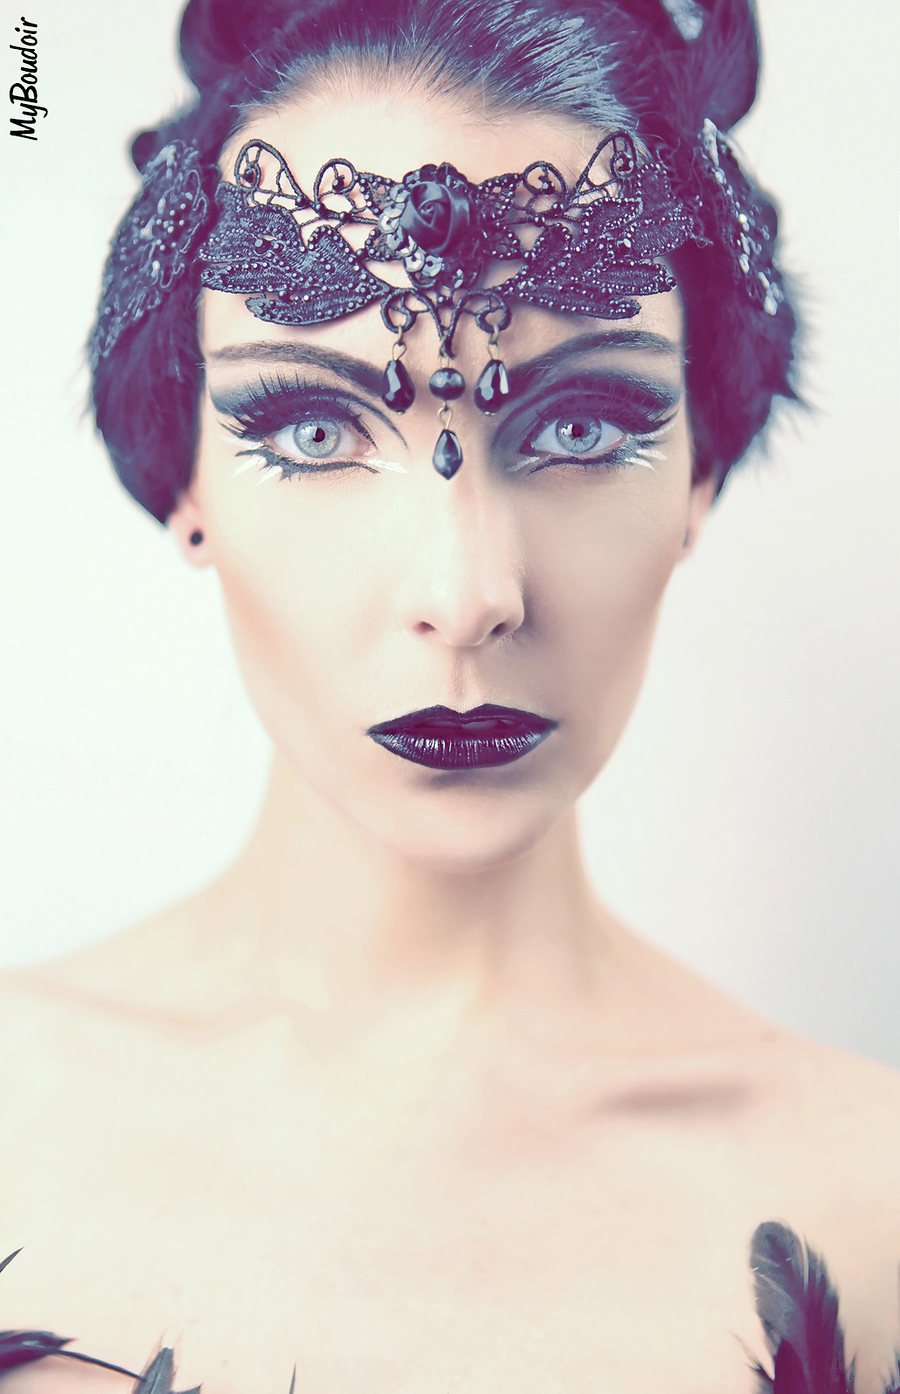 Odile's Eyes / Model Avant Garde / Uploaded 8th January 2015 @ 12:27 AM